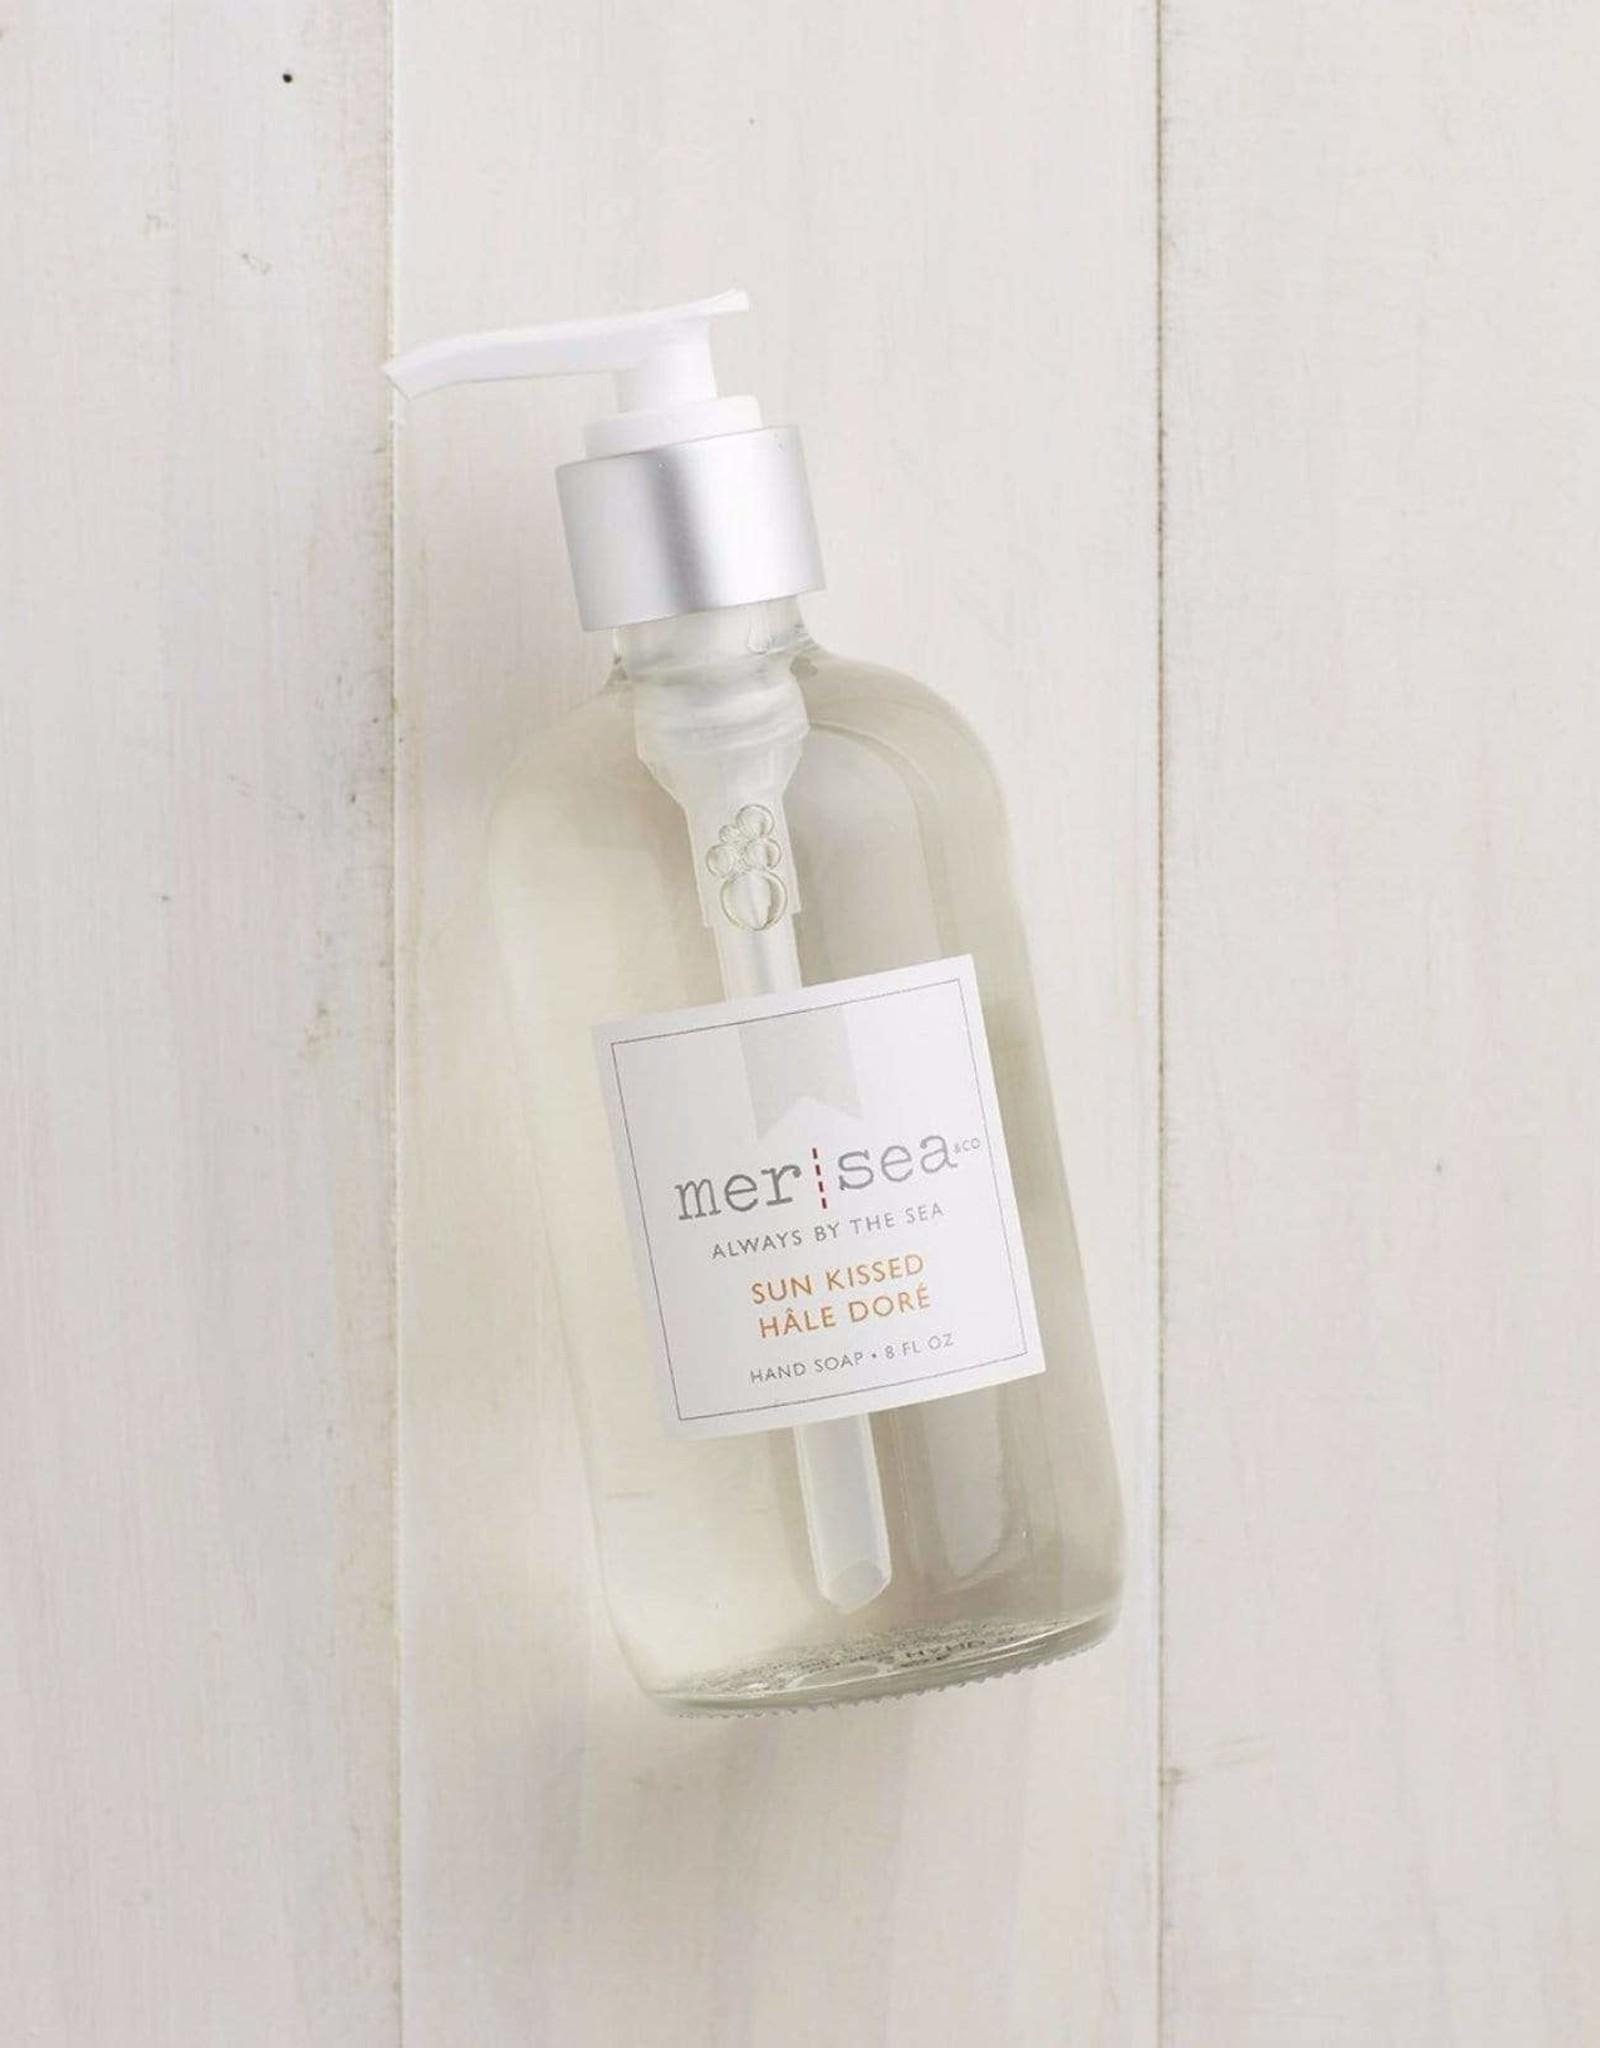 Mer Sea Sun Kissed 8oz Glass Hand Soap